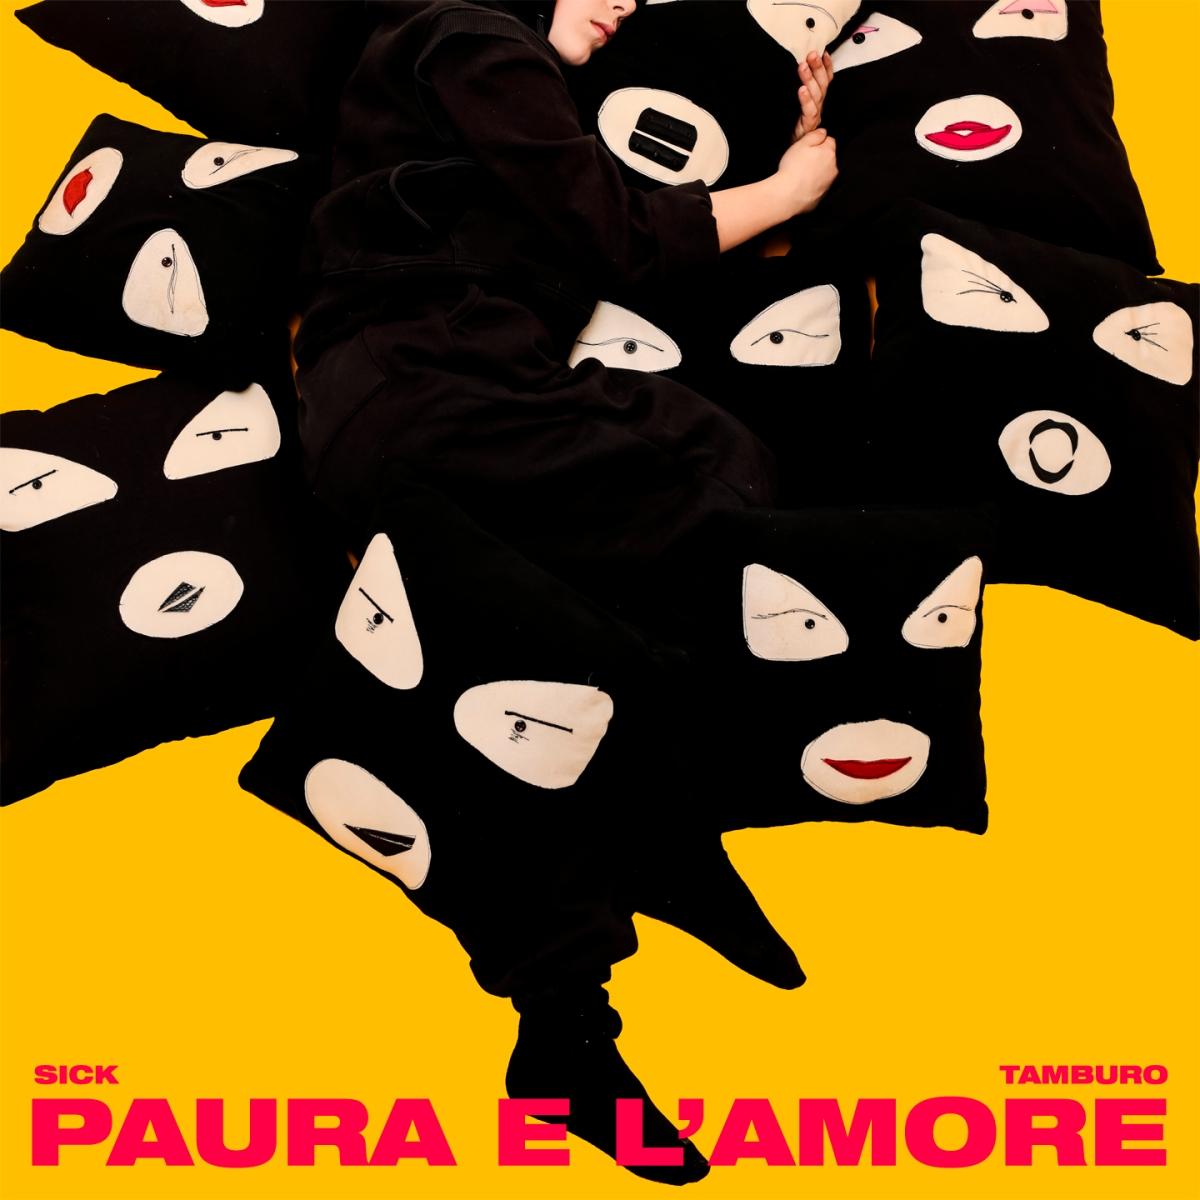 Sick Tamburo - Paura e l'amore (La Tempesta Dischi, 2019)